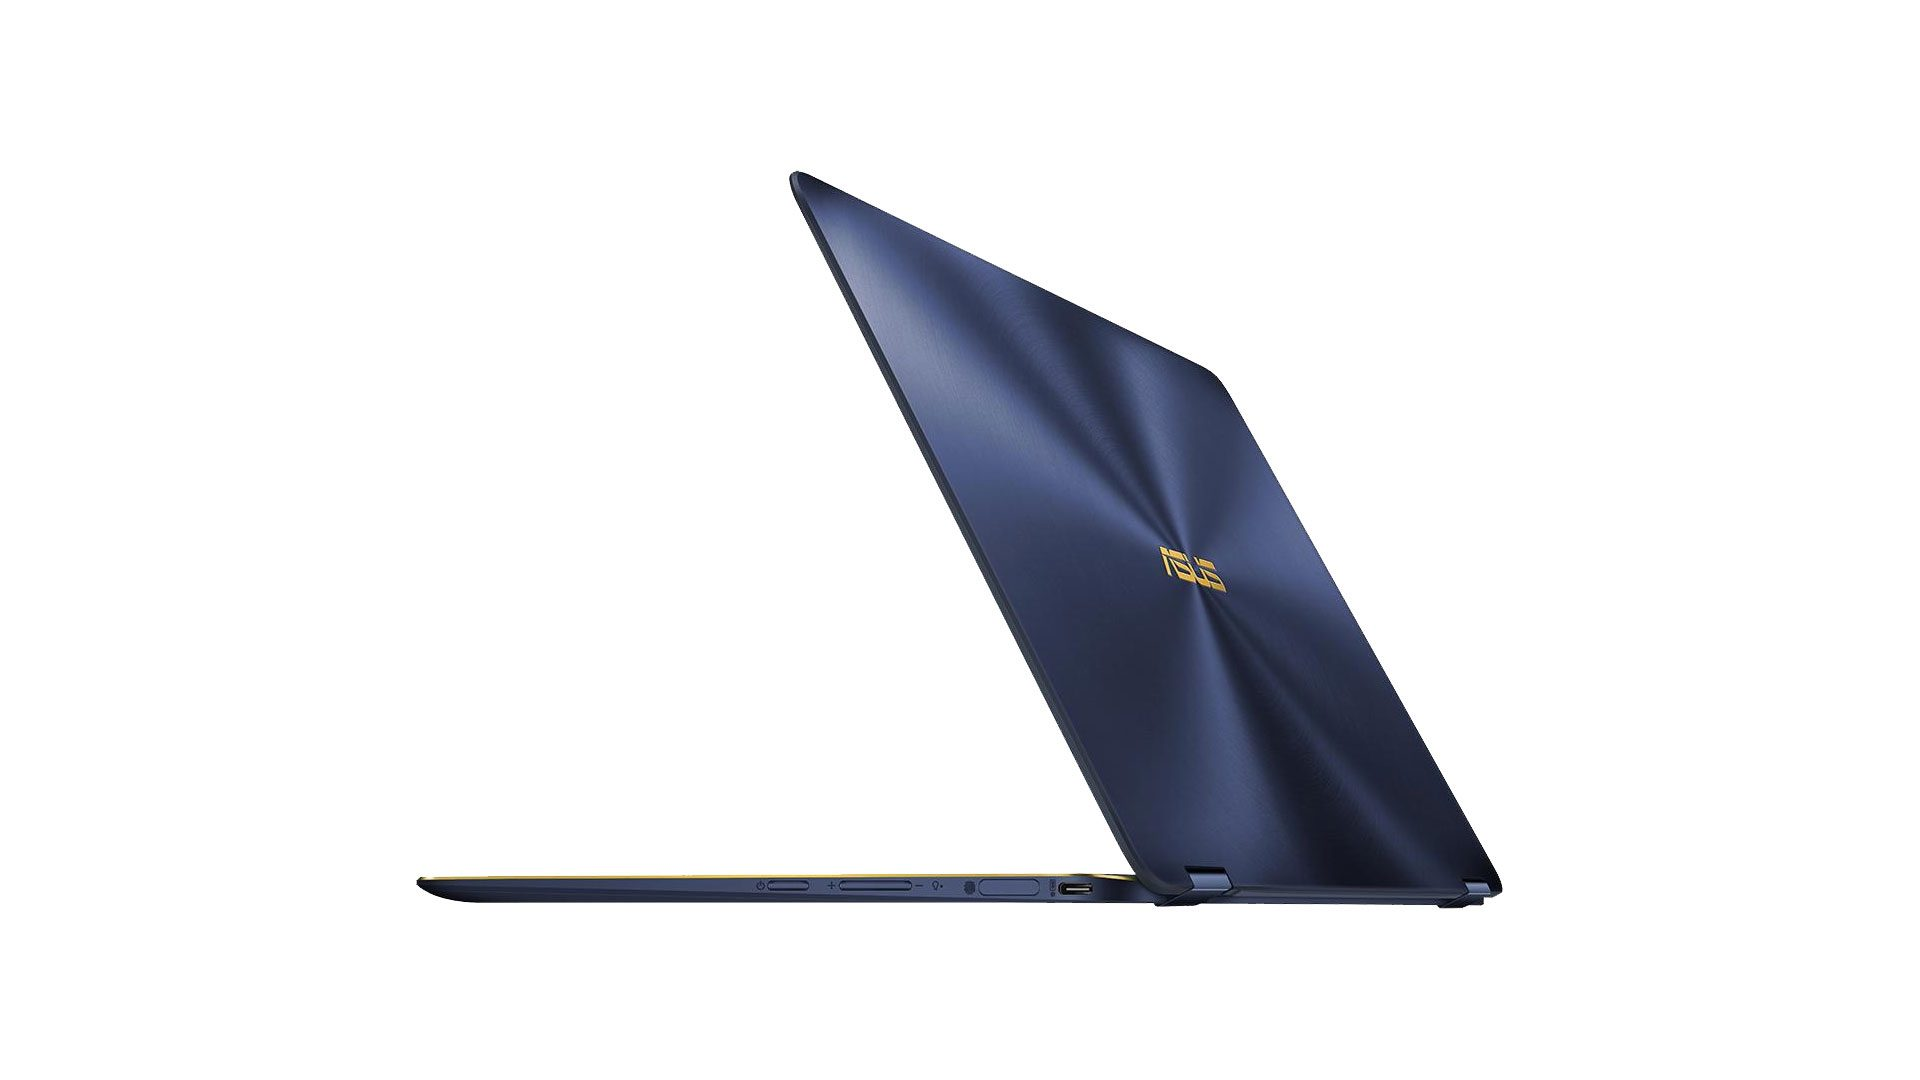 Asus-Zenbook-Flip-S-UX370_Ansicht-9